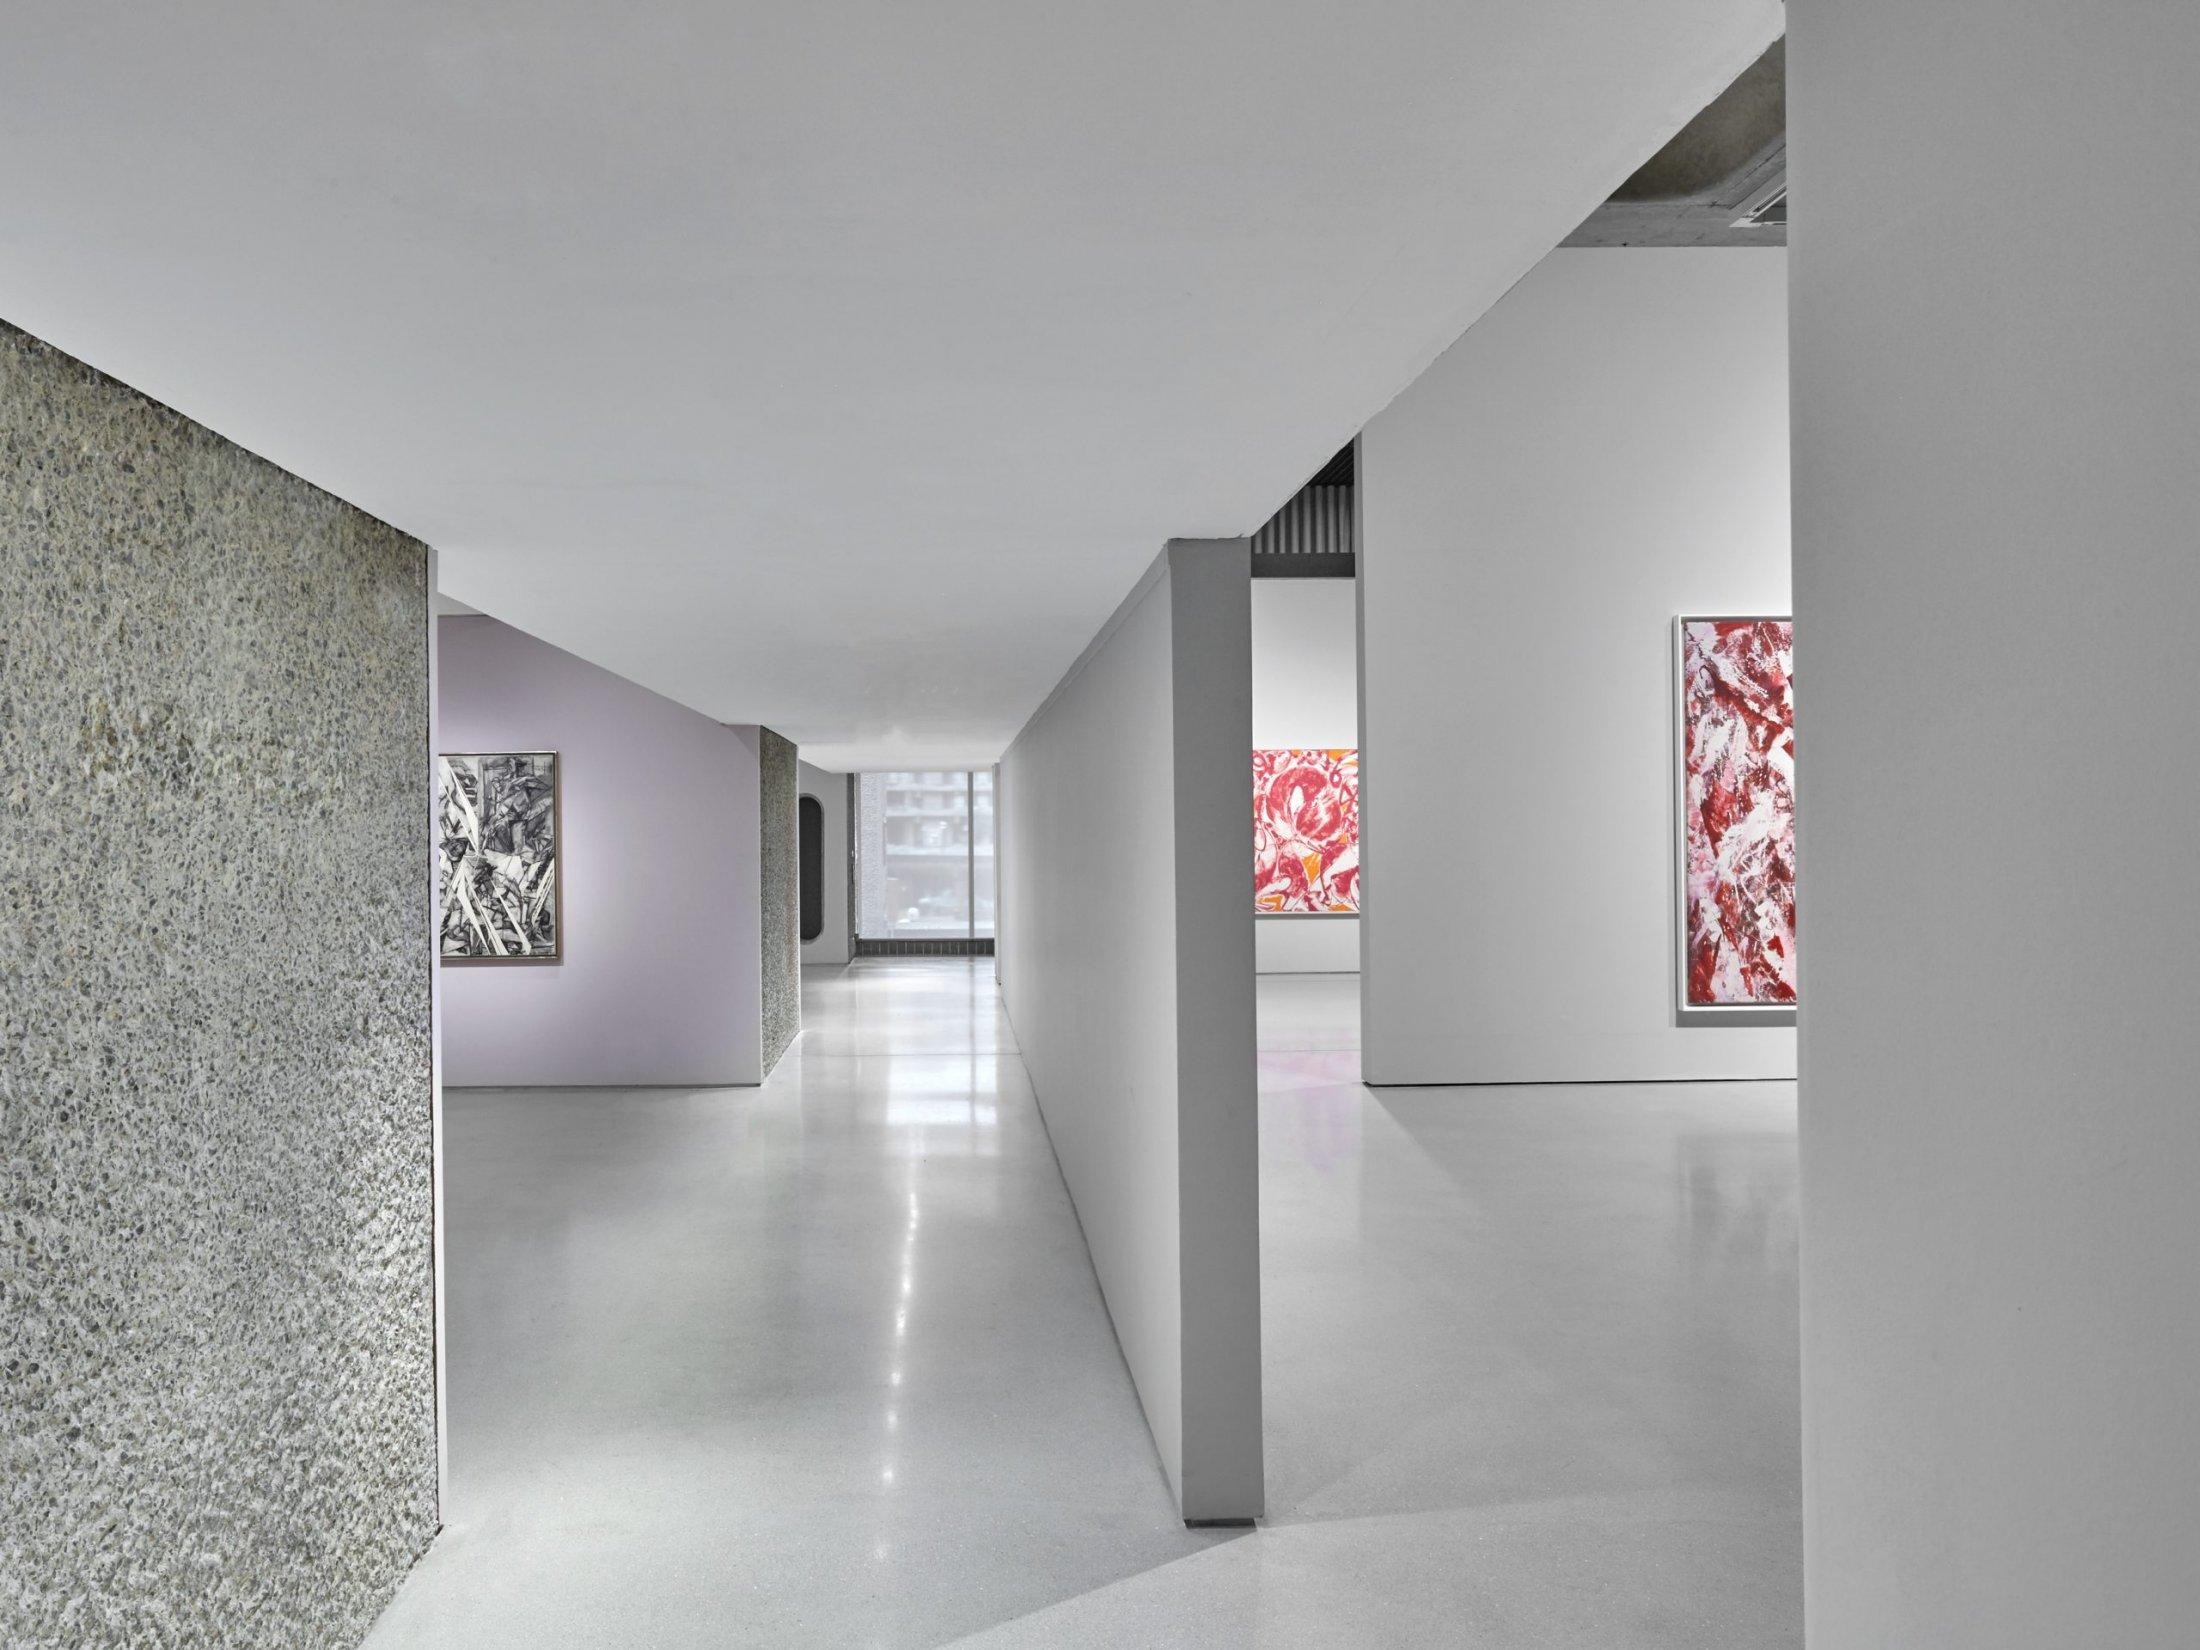 Lee Krasner: Living Colour at the Barbican